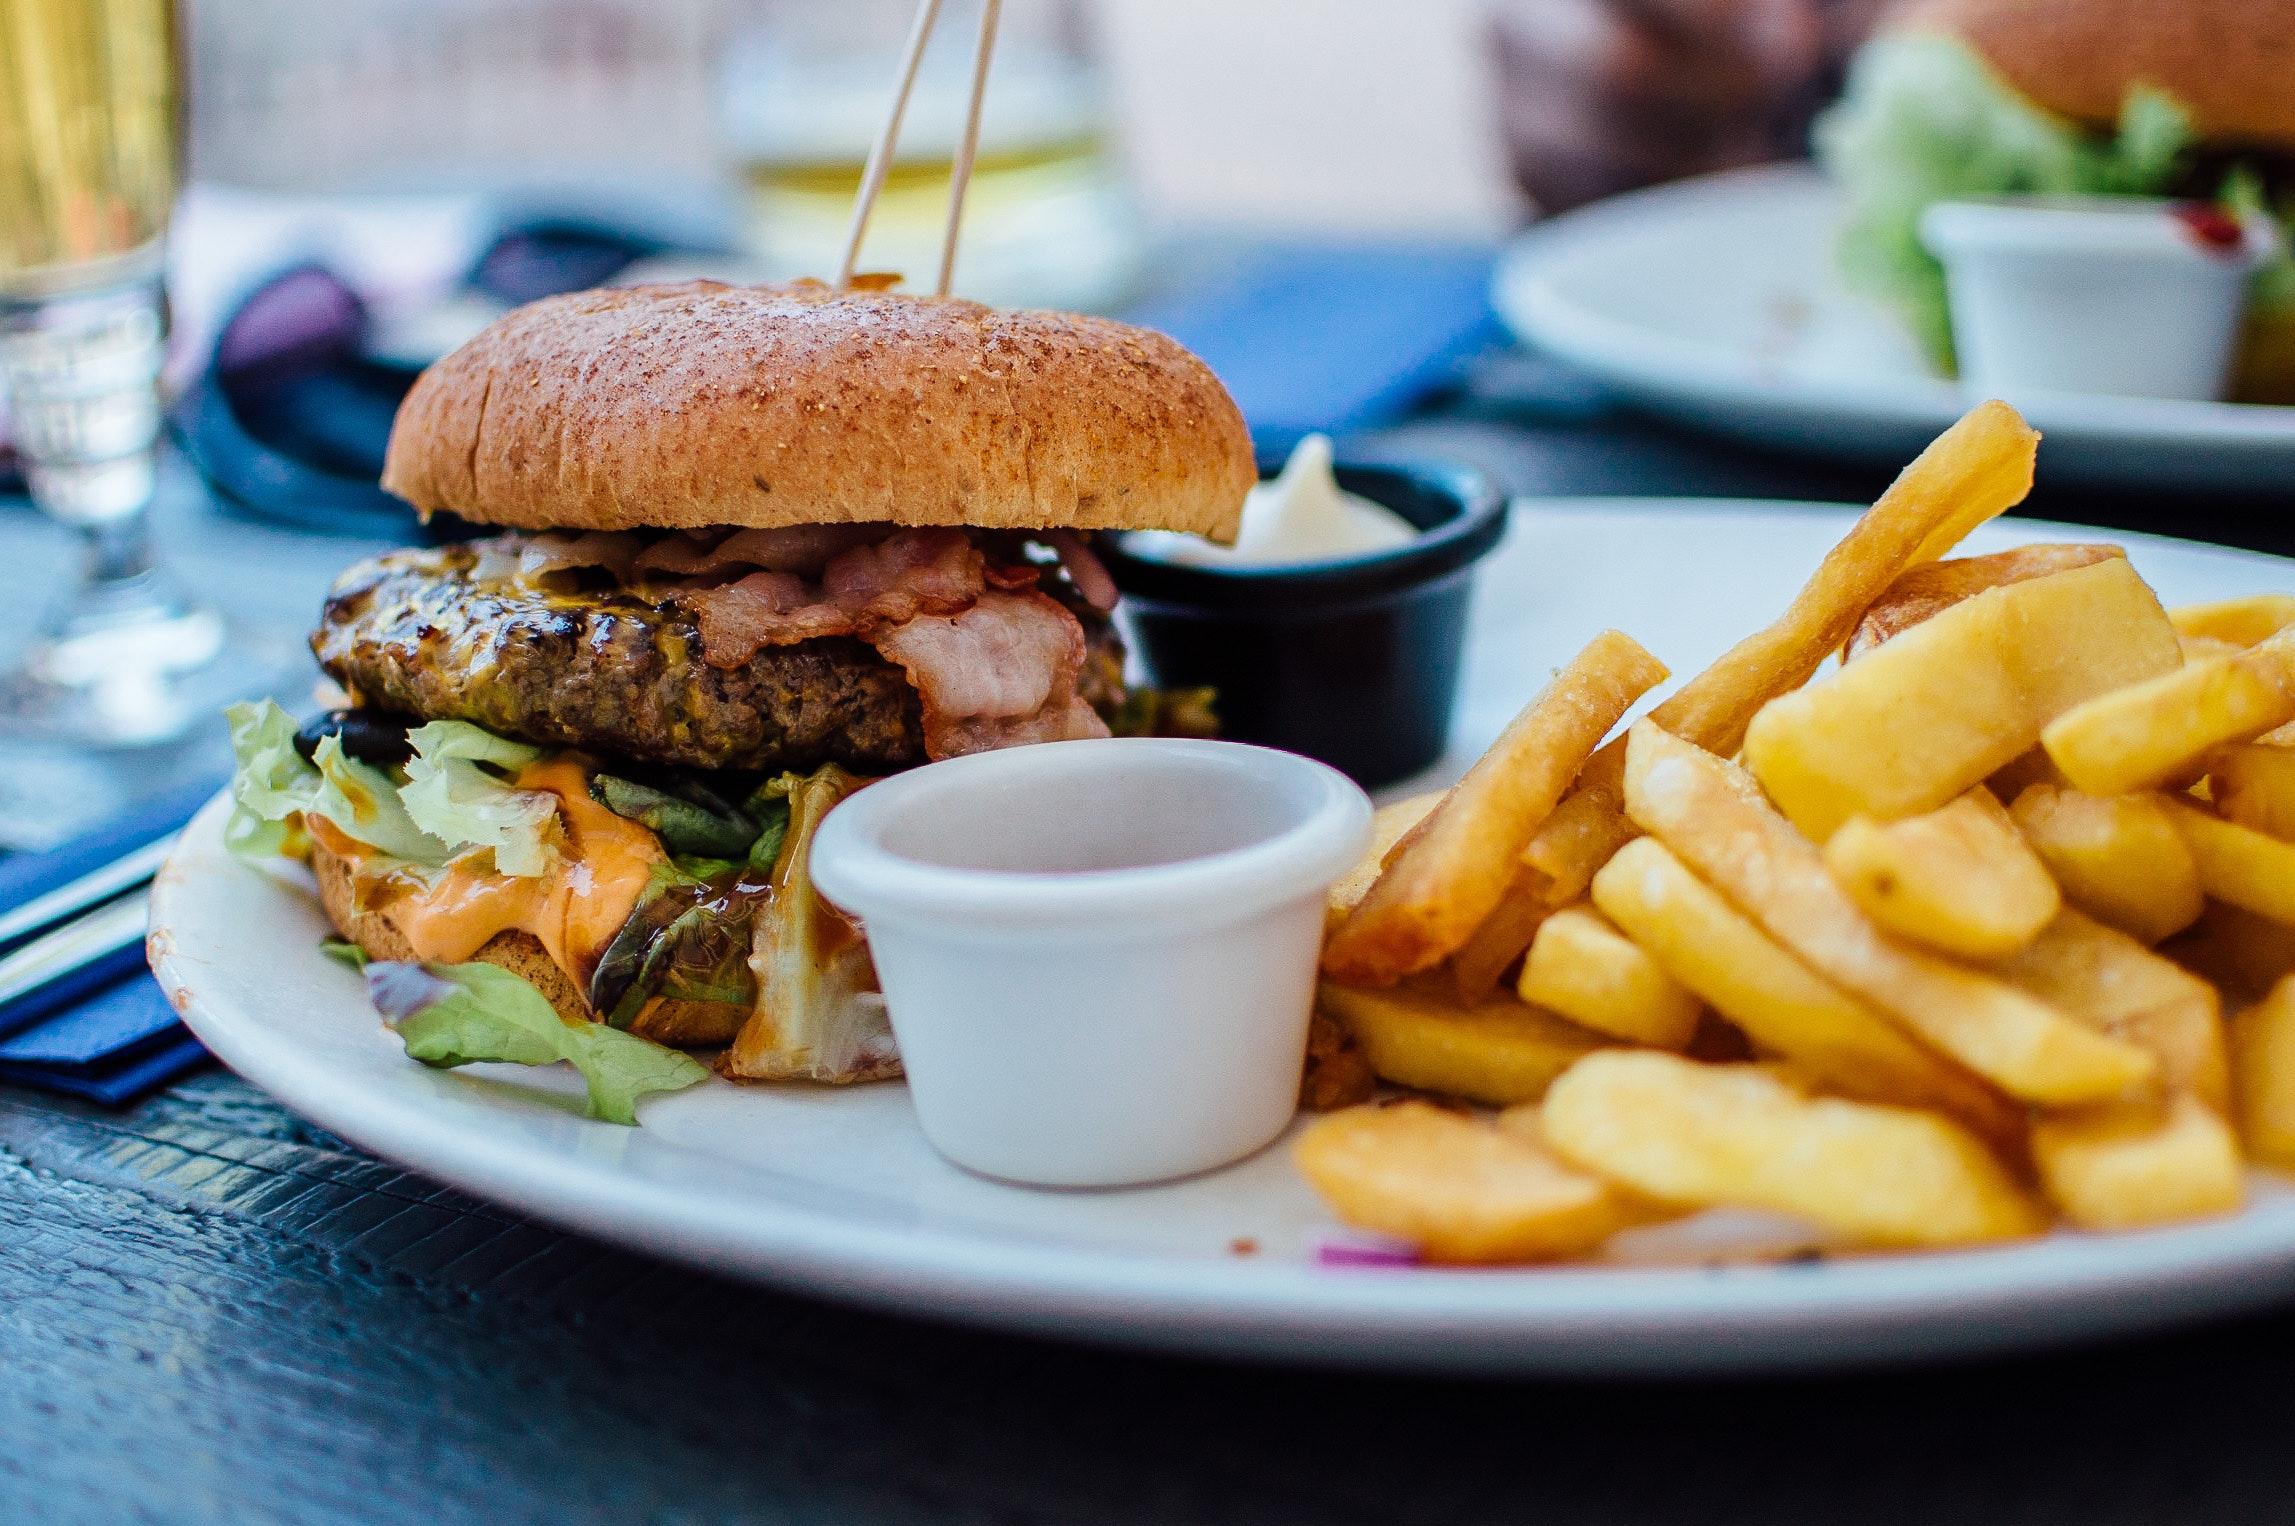 chips-dinner-fast-food-70497.jpg